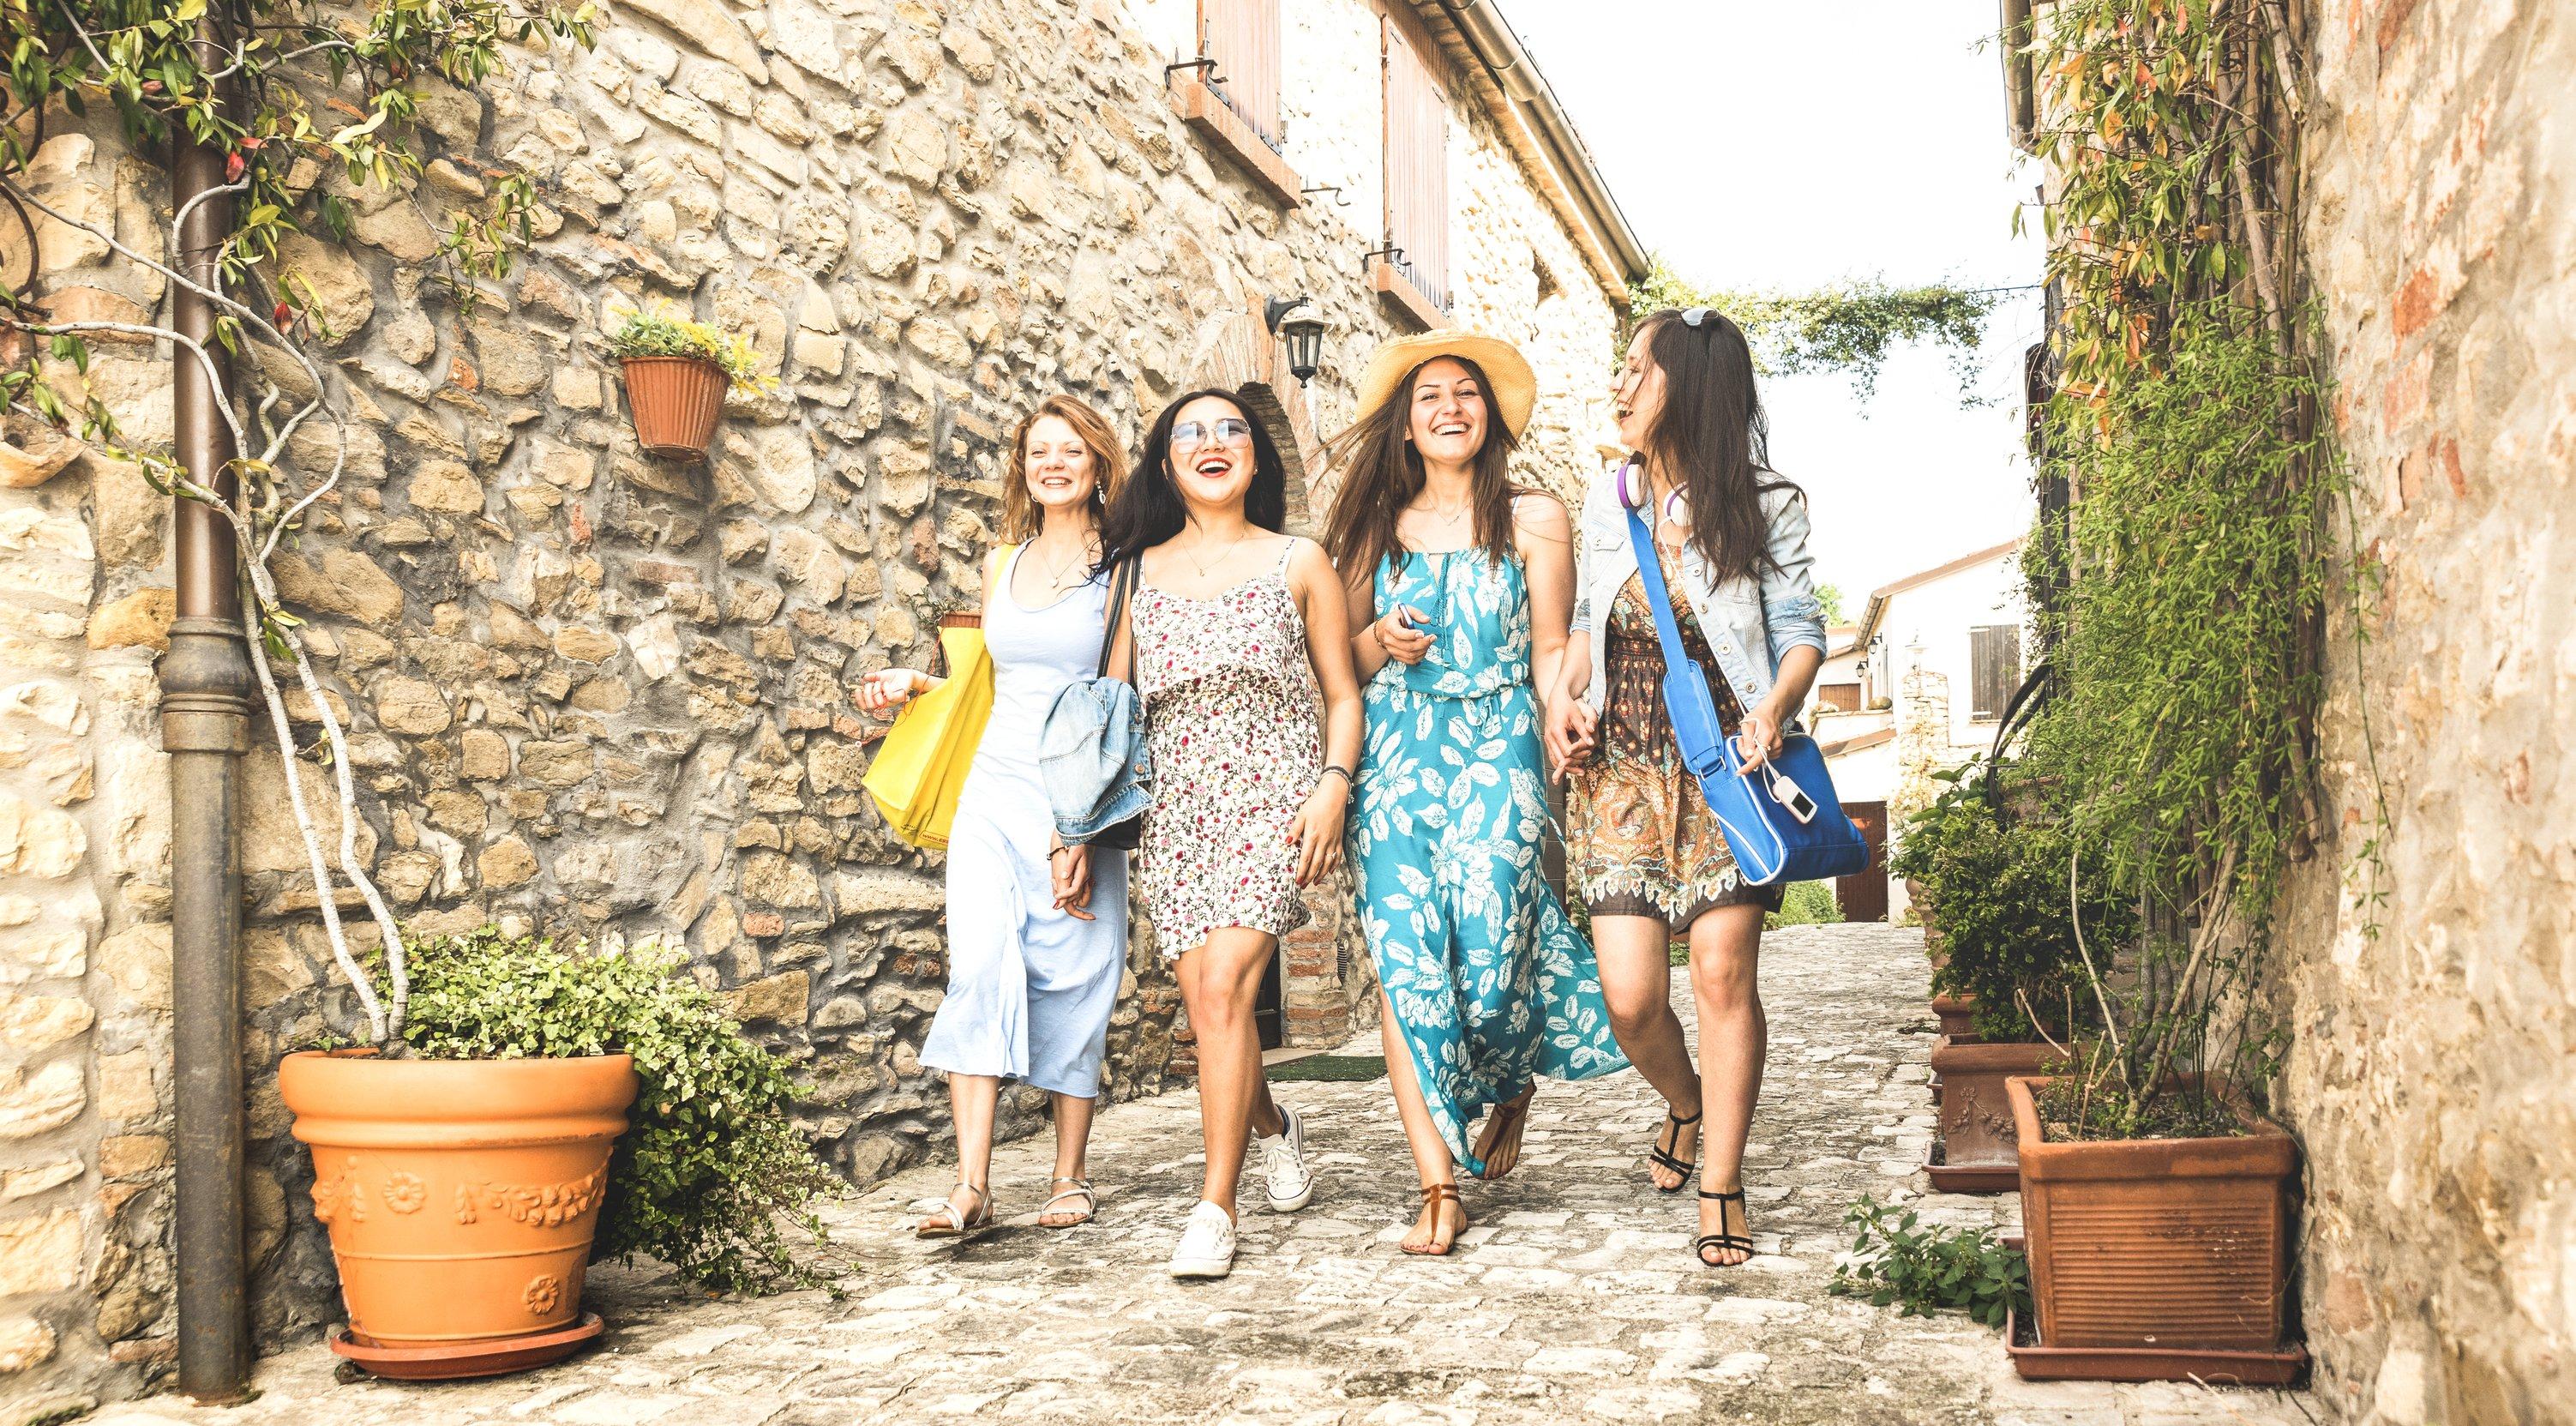 Millennials trust peer groups